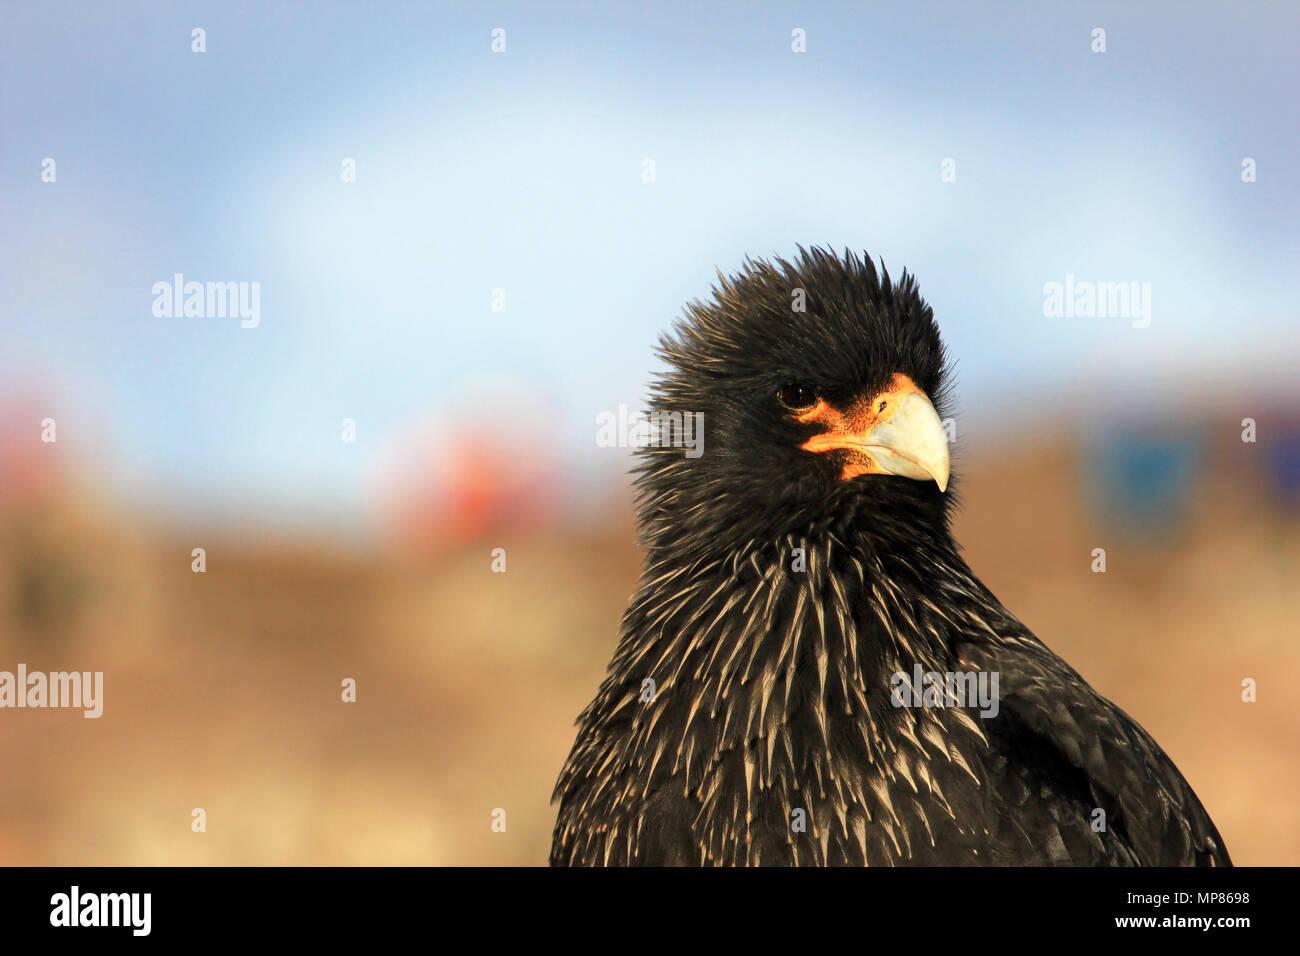 Striated Caracara, phalcoboenus australis, Falkland Islands Stock Photo